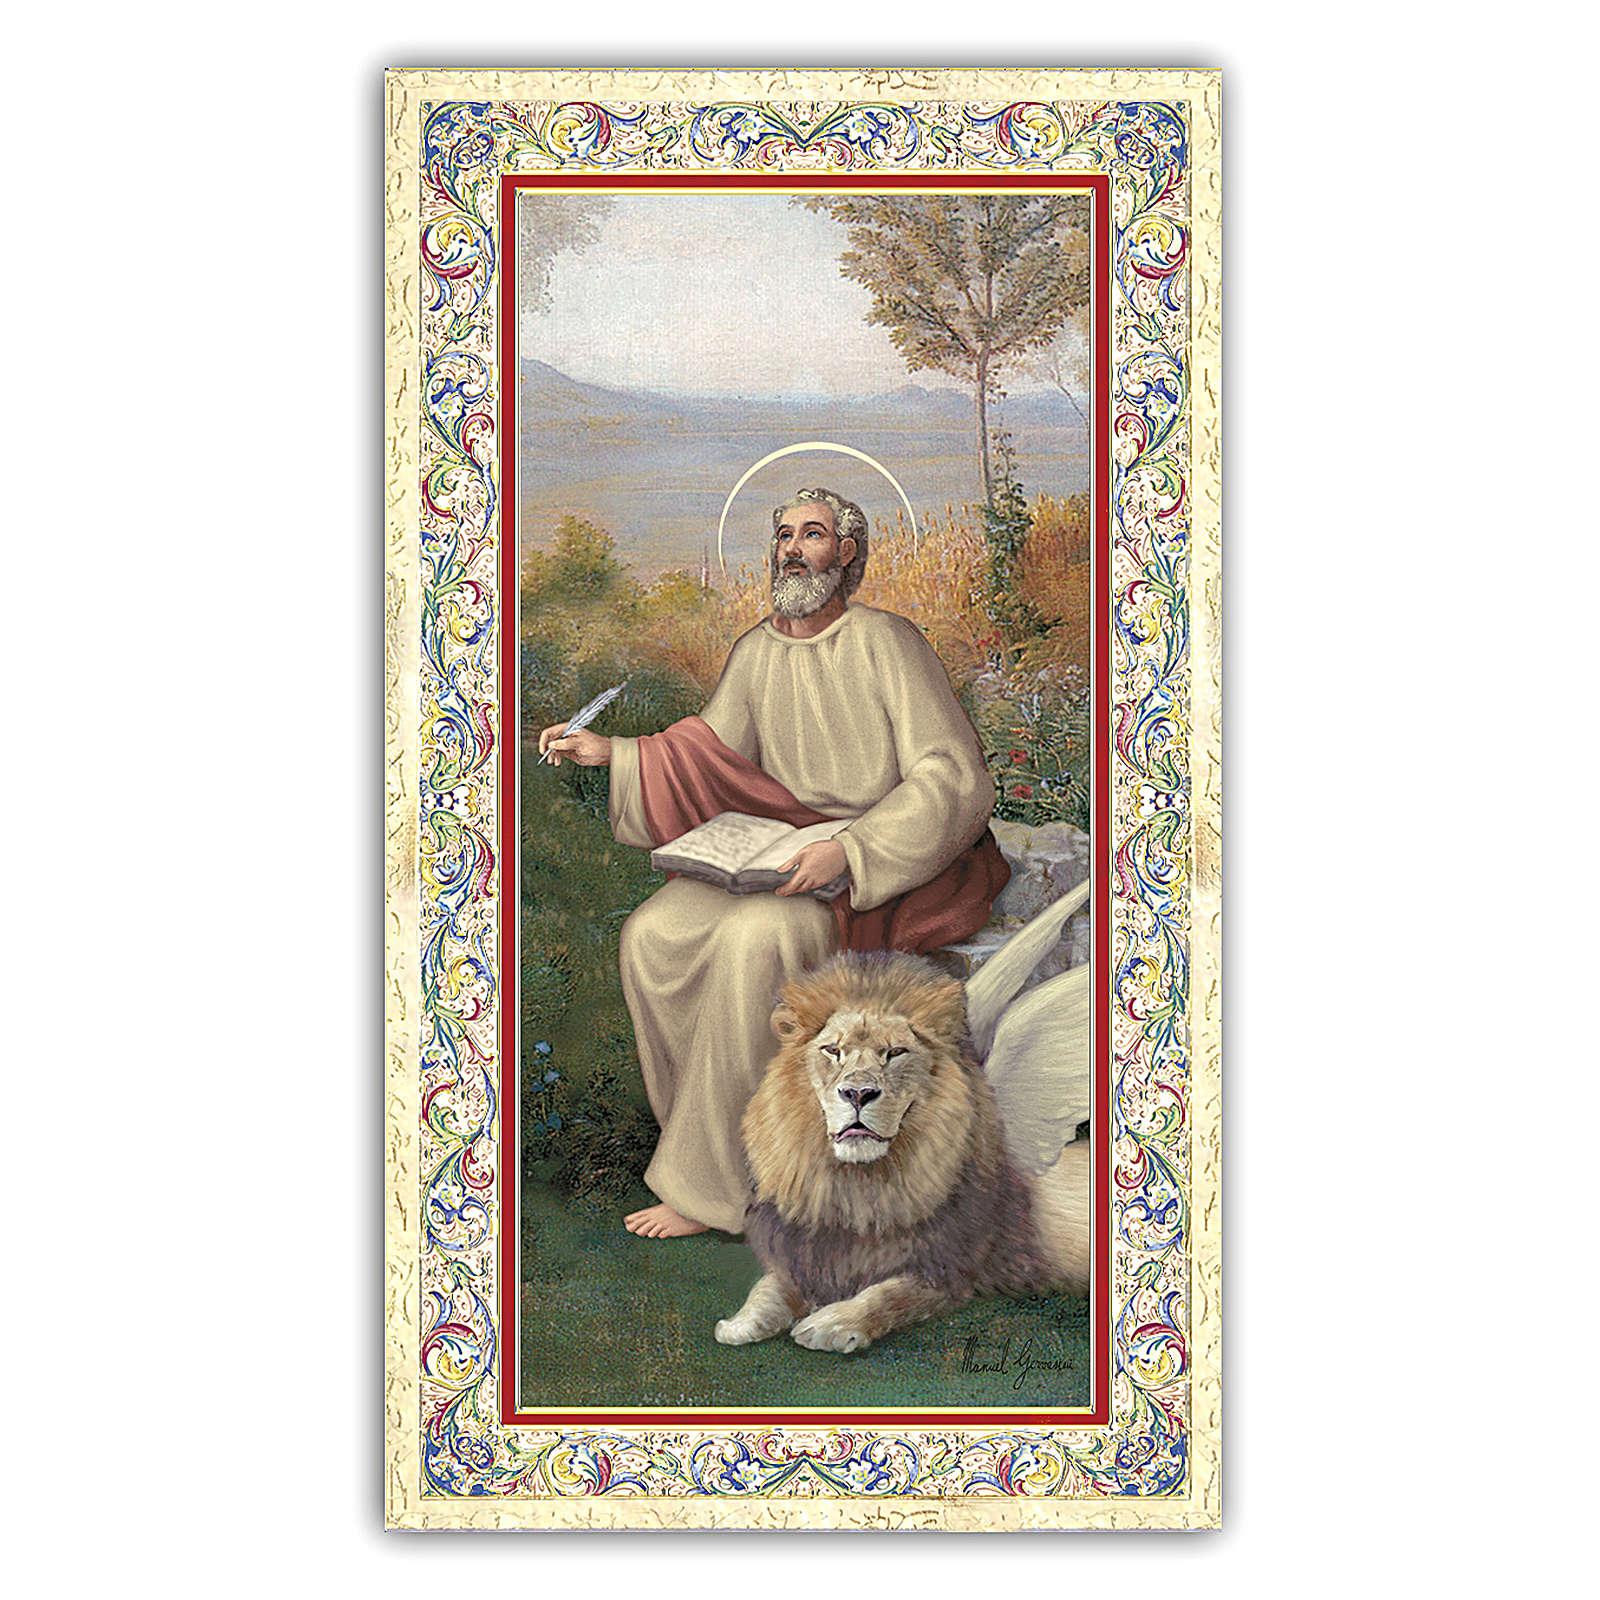 Santino San Marco Evangelista 10x5 cm ITA 4